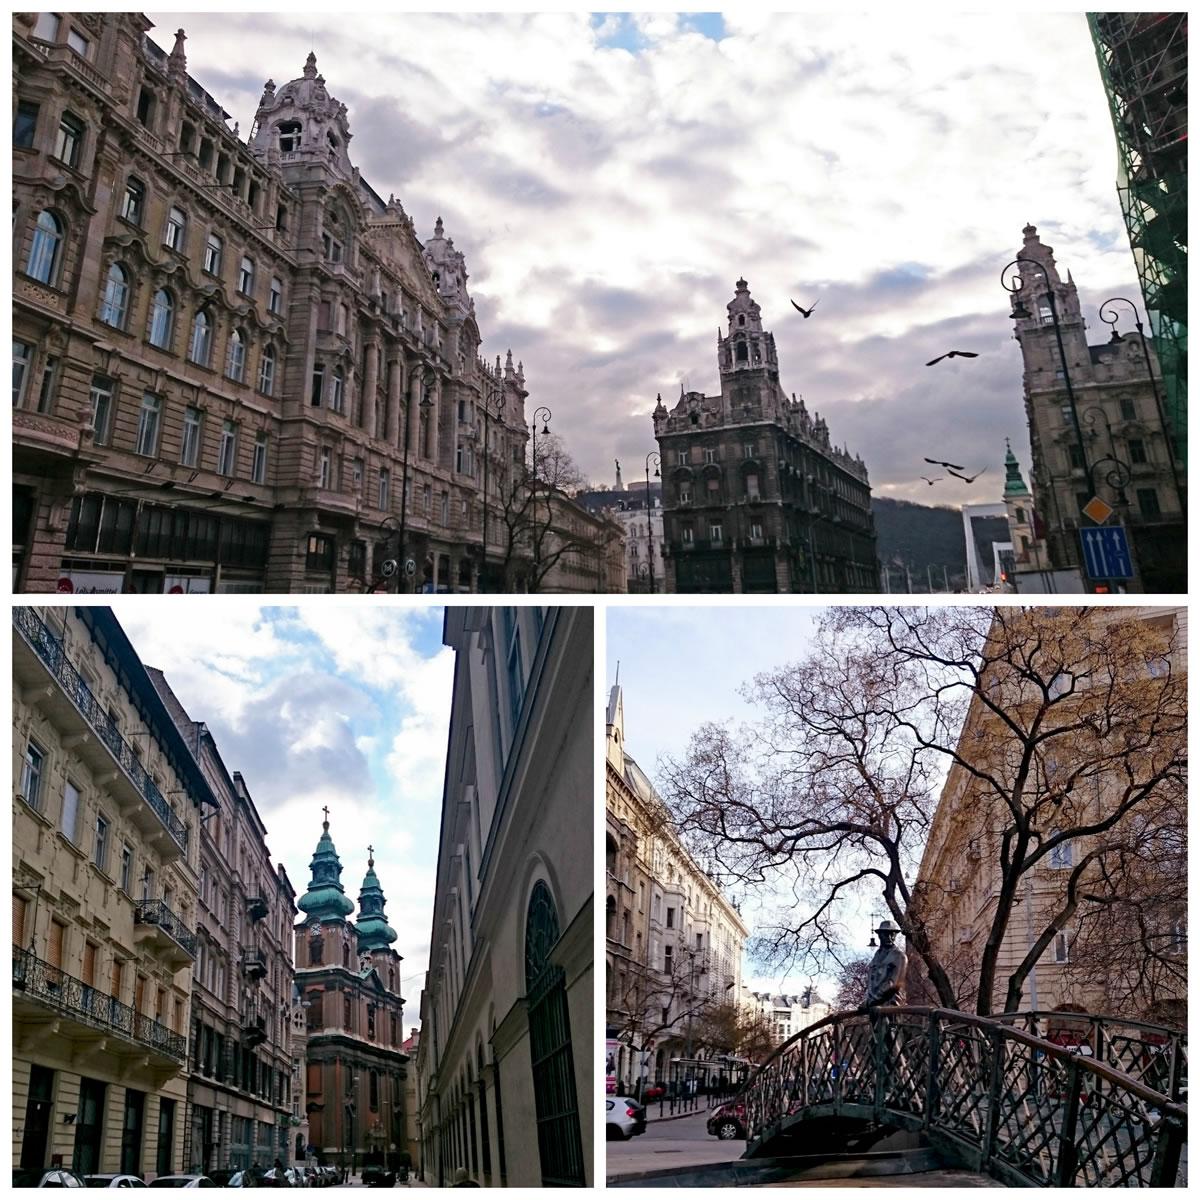 Pest-centre-ville-Budapest